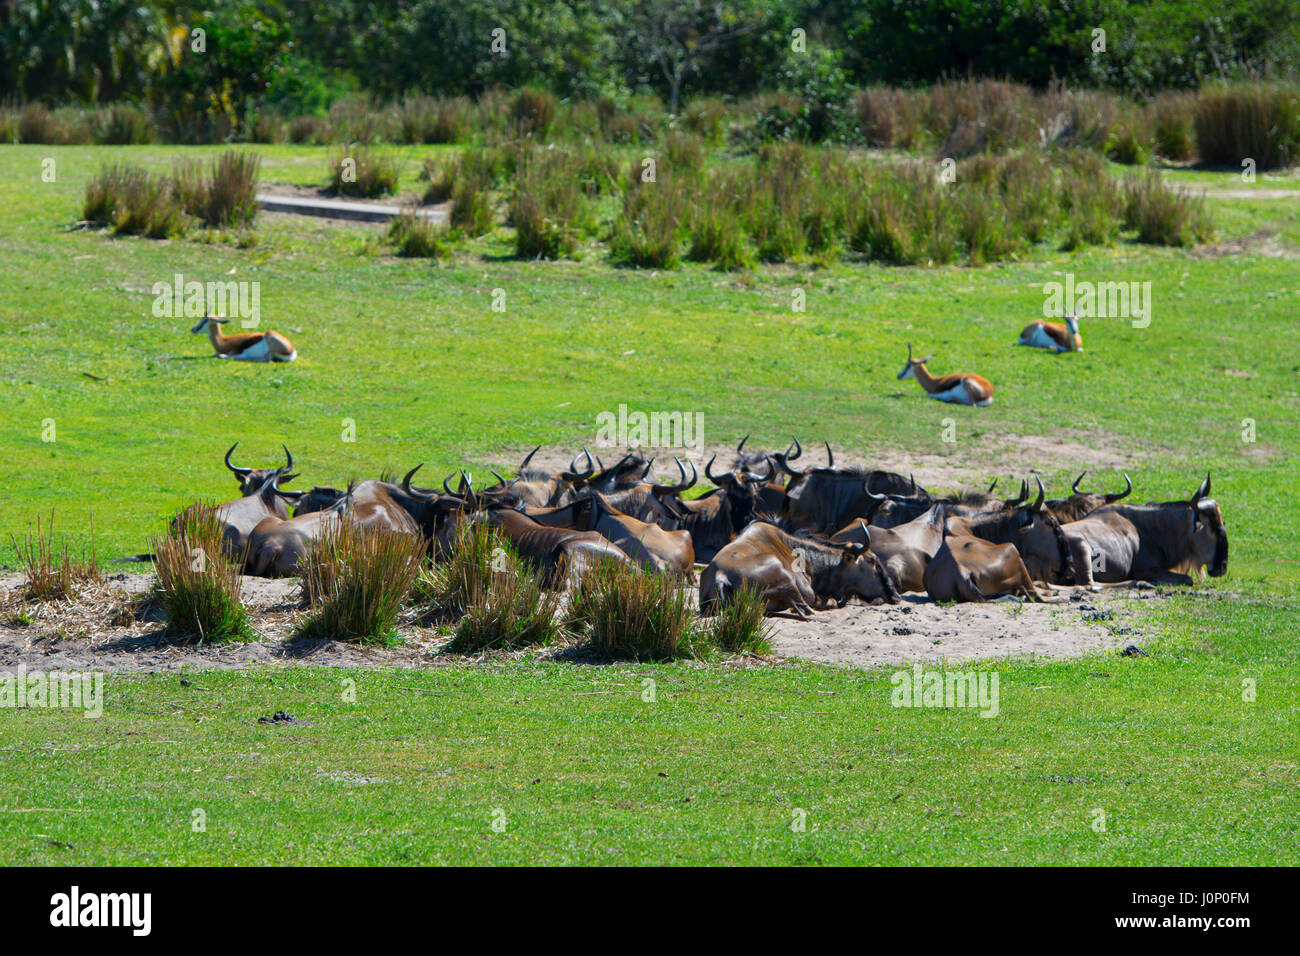 Animals, Wildebeest at Disney Animal Kingdom, Disney World, Orlando Florida - Stock Image